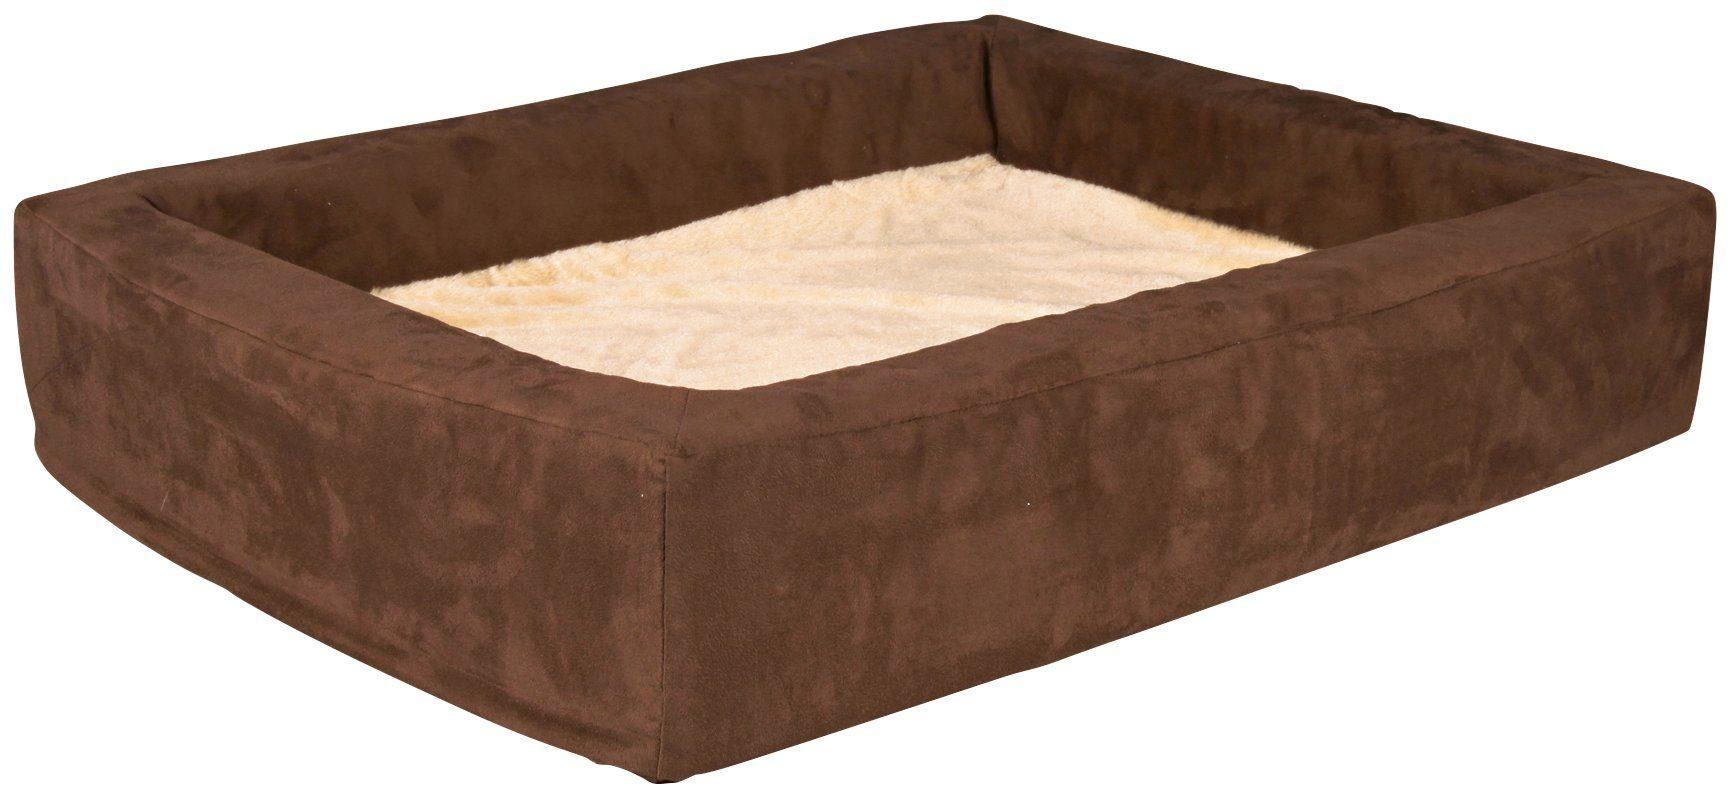 Hunde-Bett »Vital Bett Memory«, BxL: 70x56 cm, braun/beige